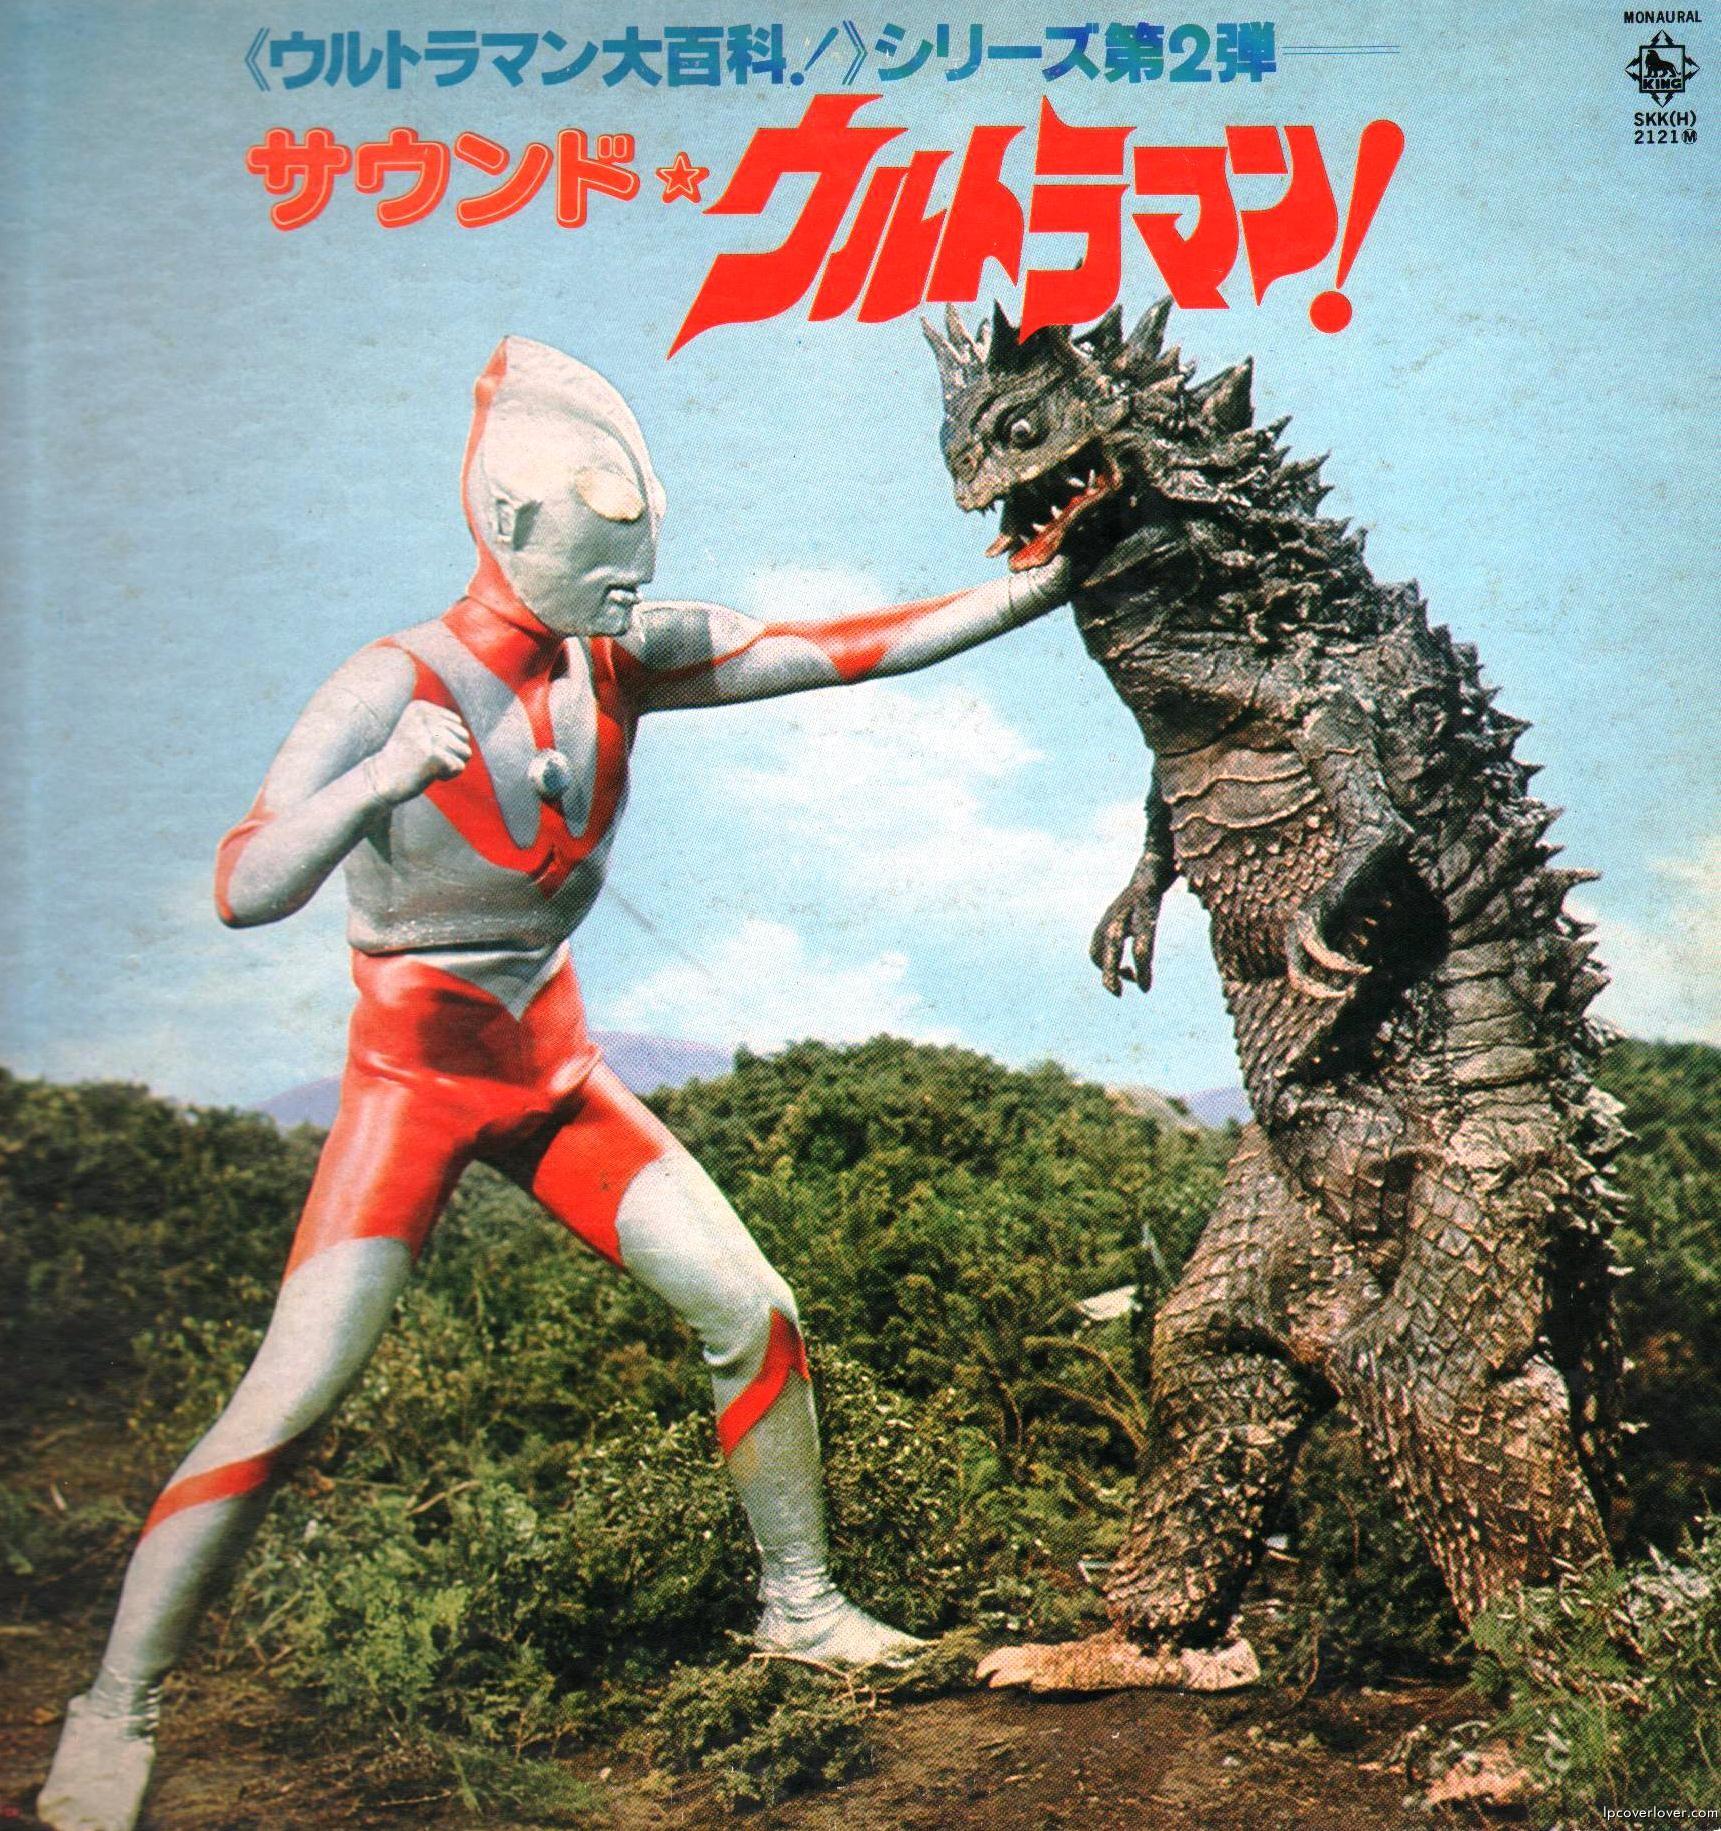 Lpcover Lover Soundtracks Balon Motif Ultraman King Records Japan 1978